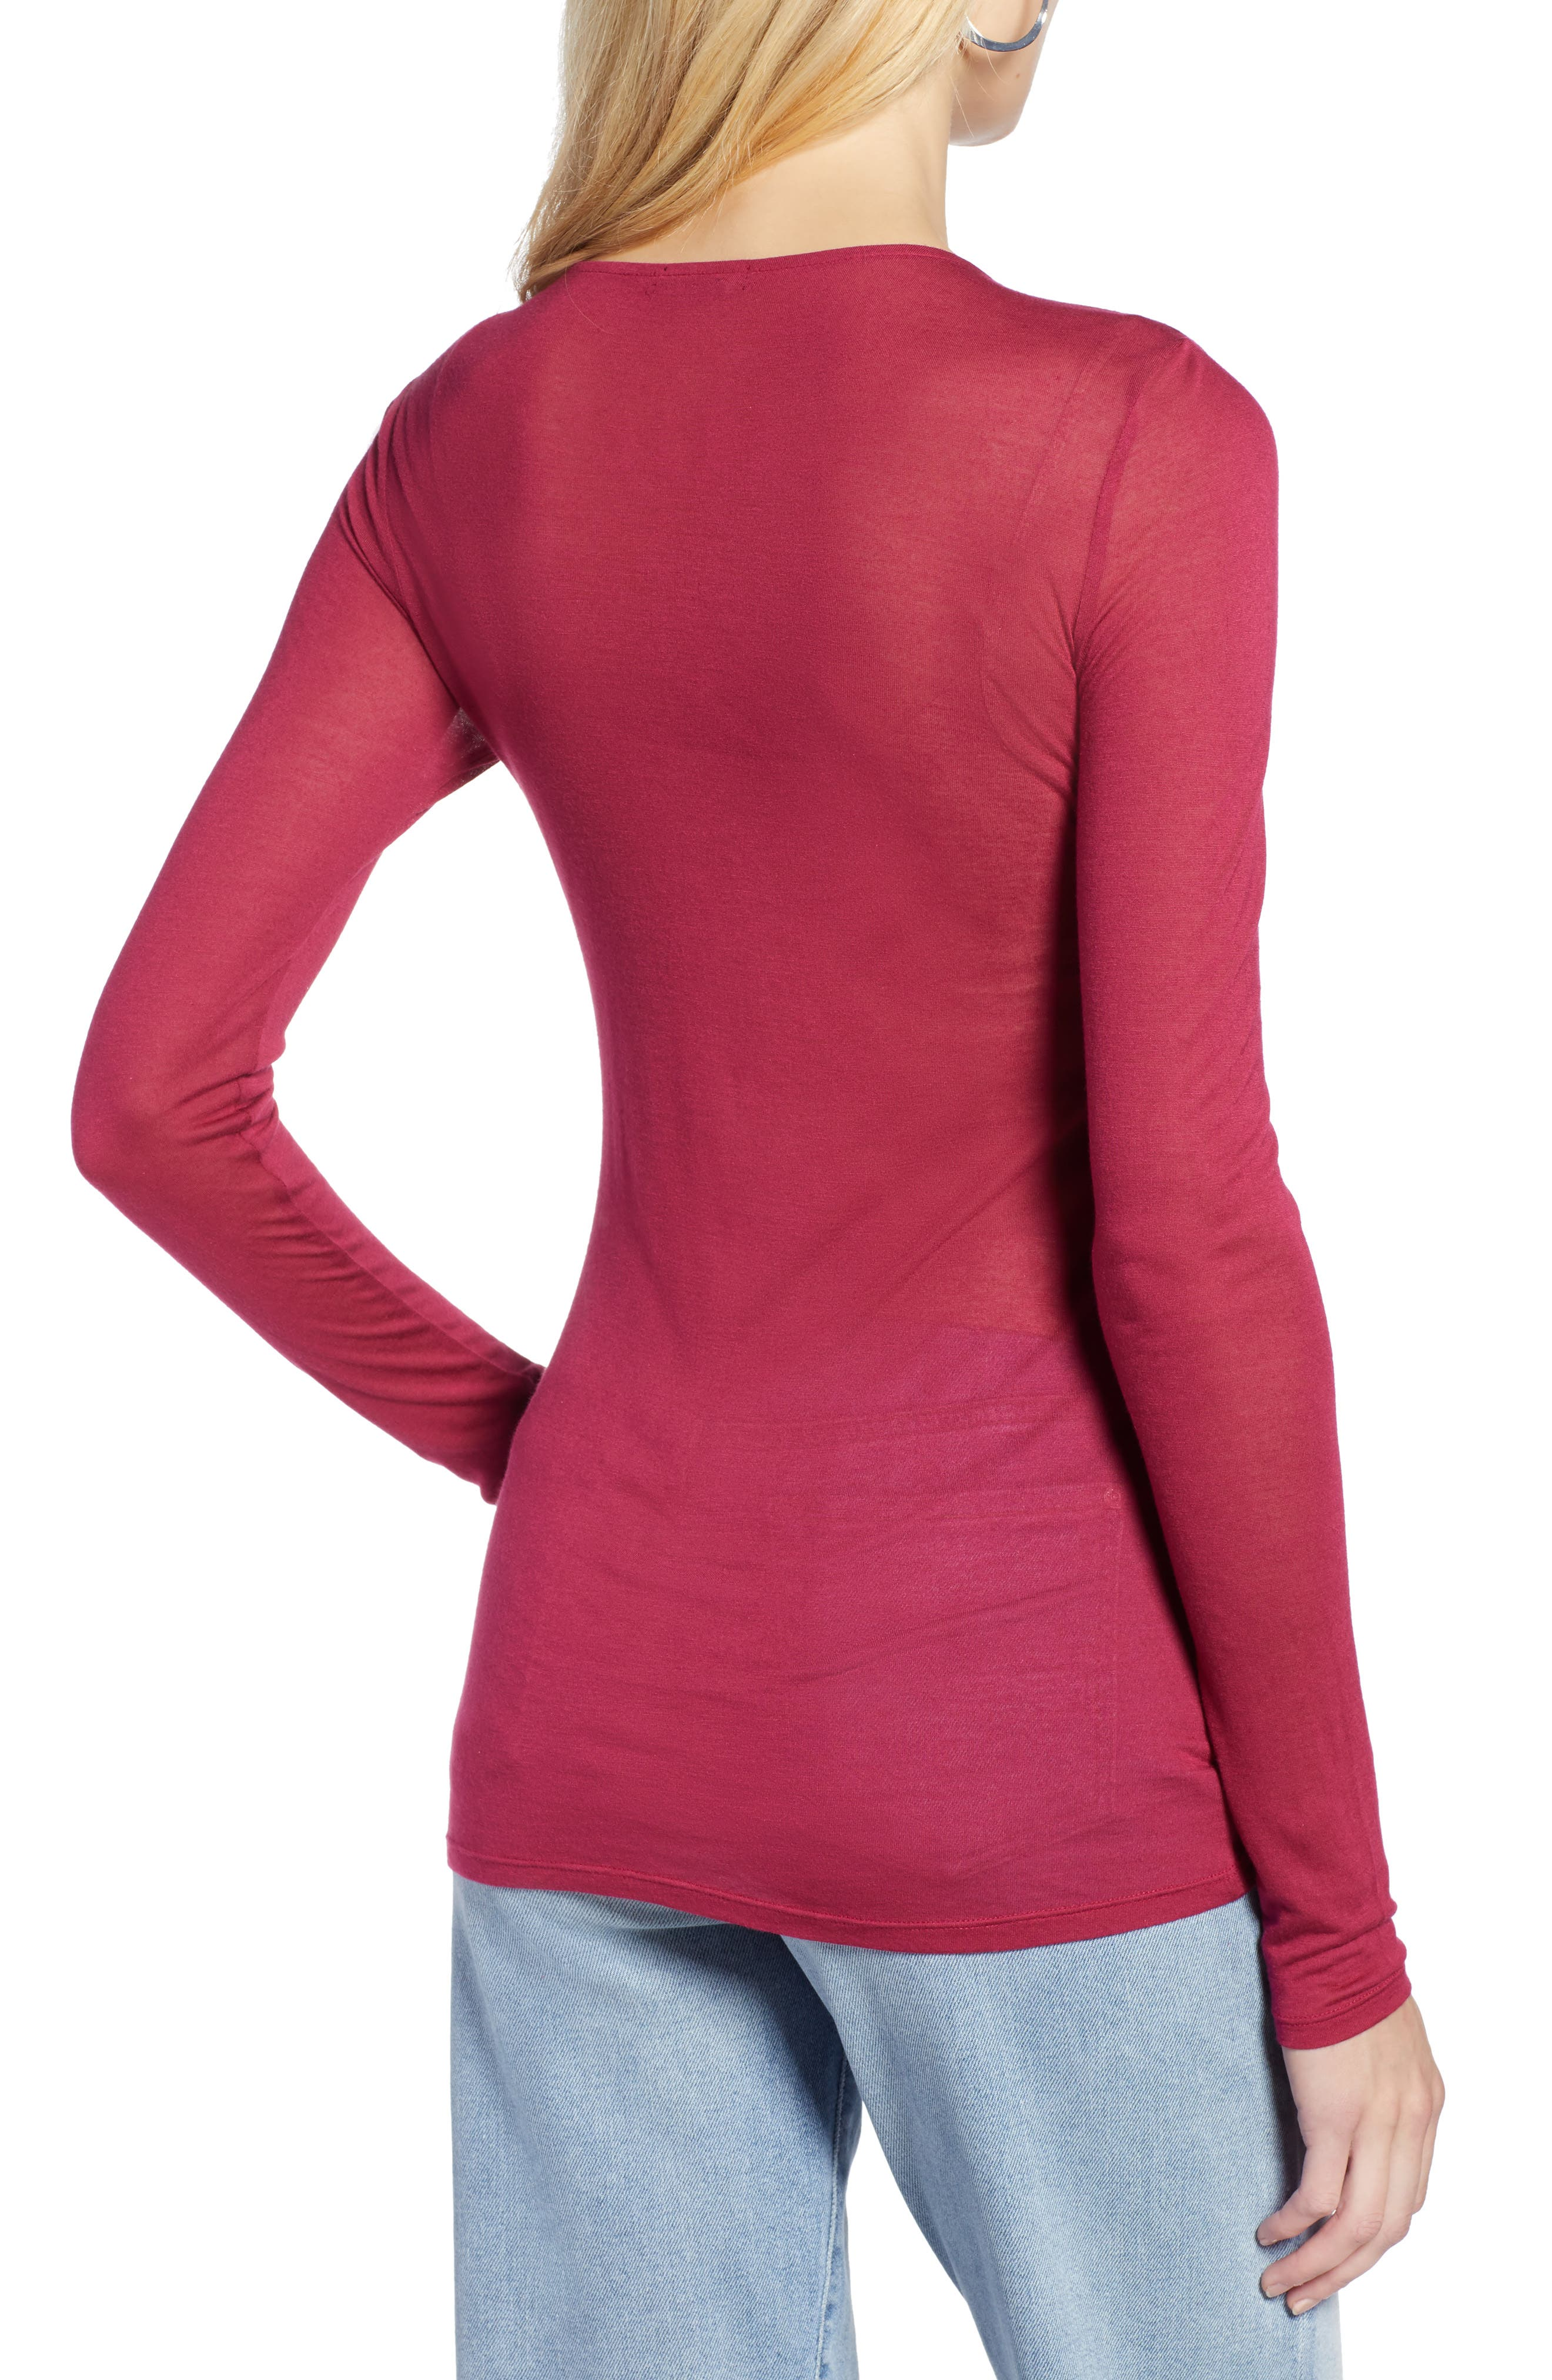 Sheer Knit Top,                             Alternate thumbnail 2, color,                             938